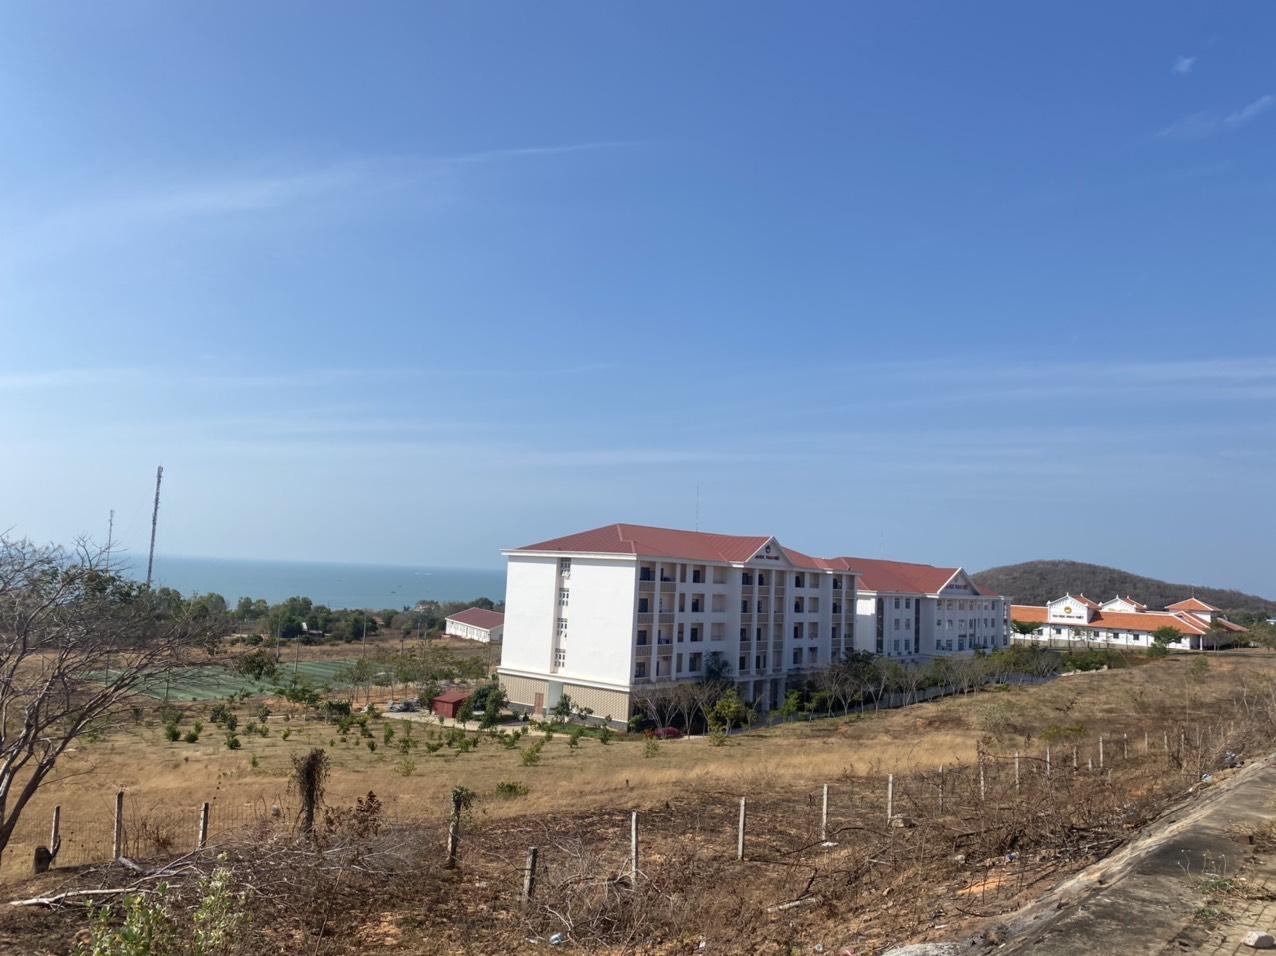 Cap nhat Tien do thi cong Du an The Seahara Phan Thiet - THE SEAHARA HOTEL & RESORT PHAN THIẾT